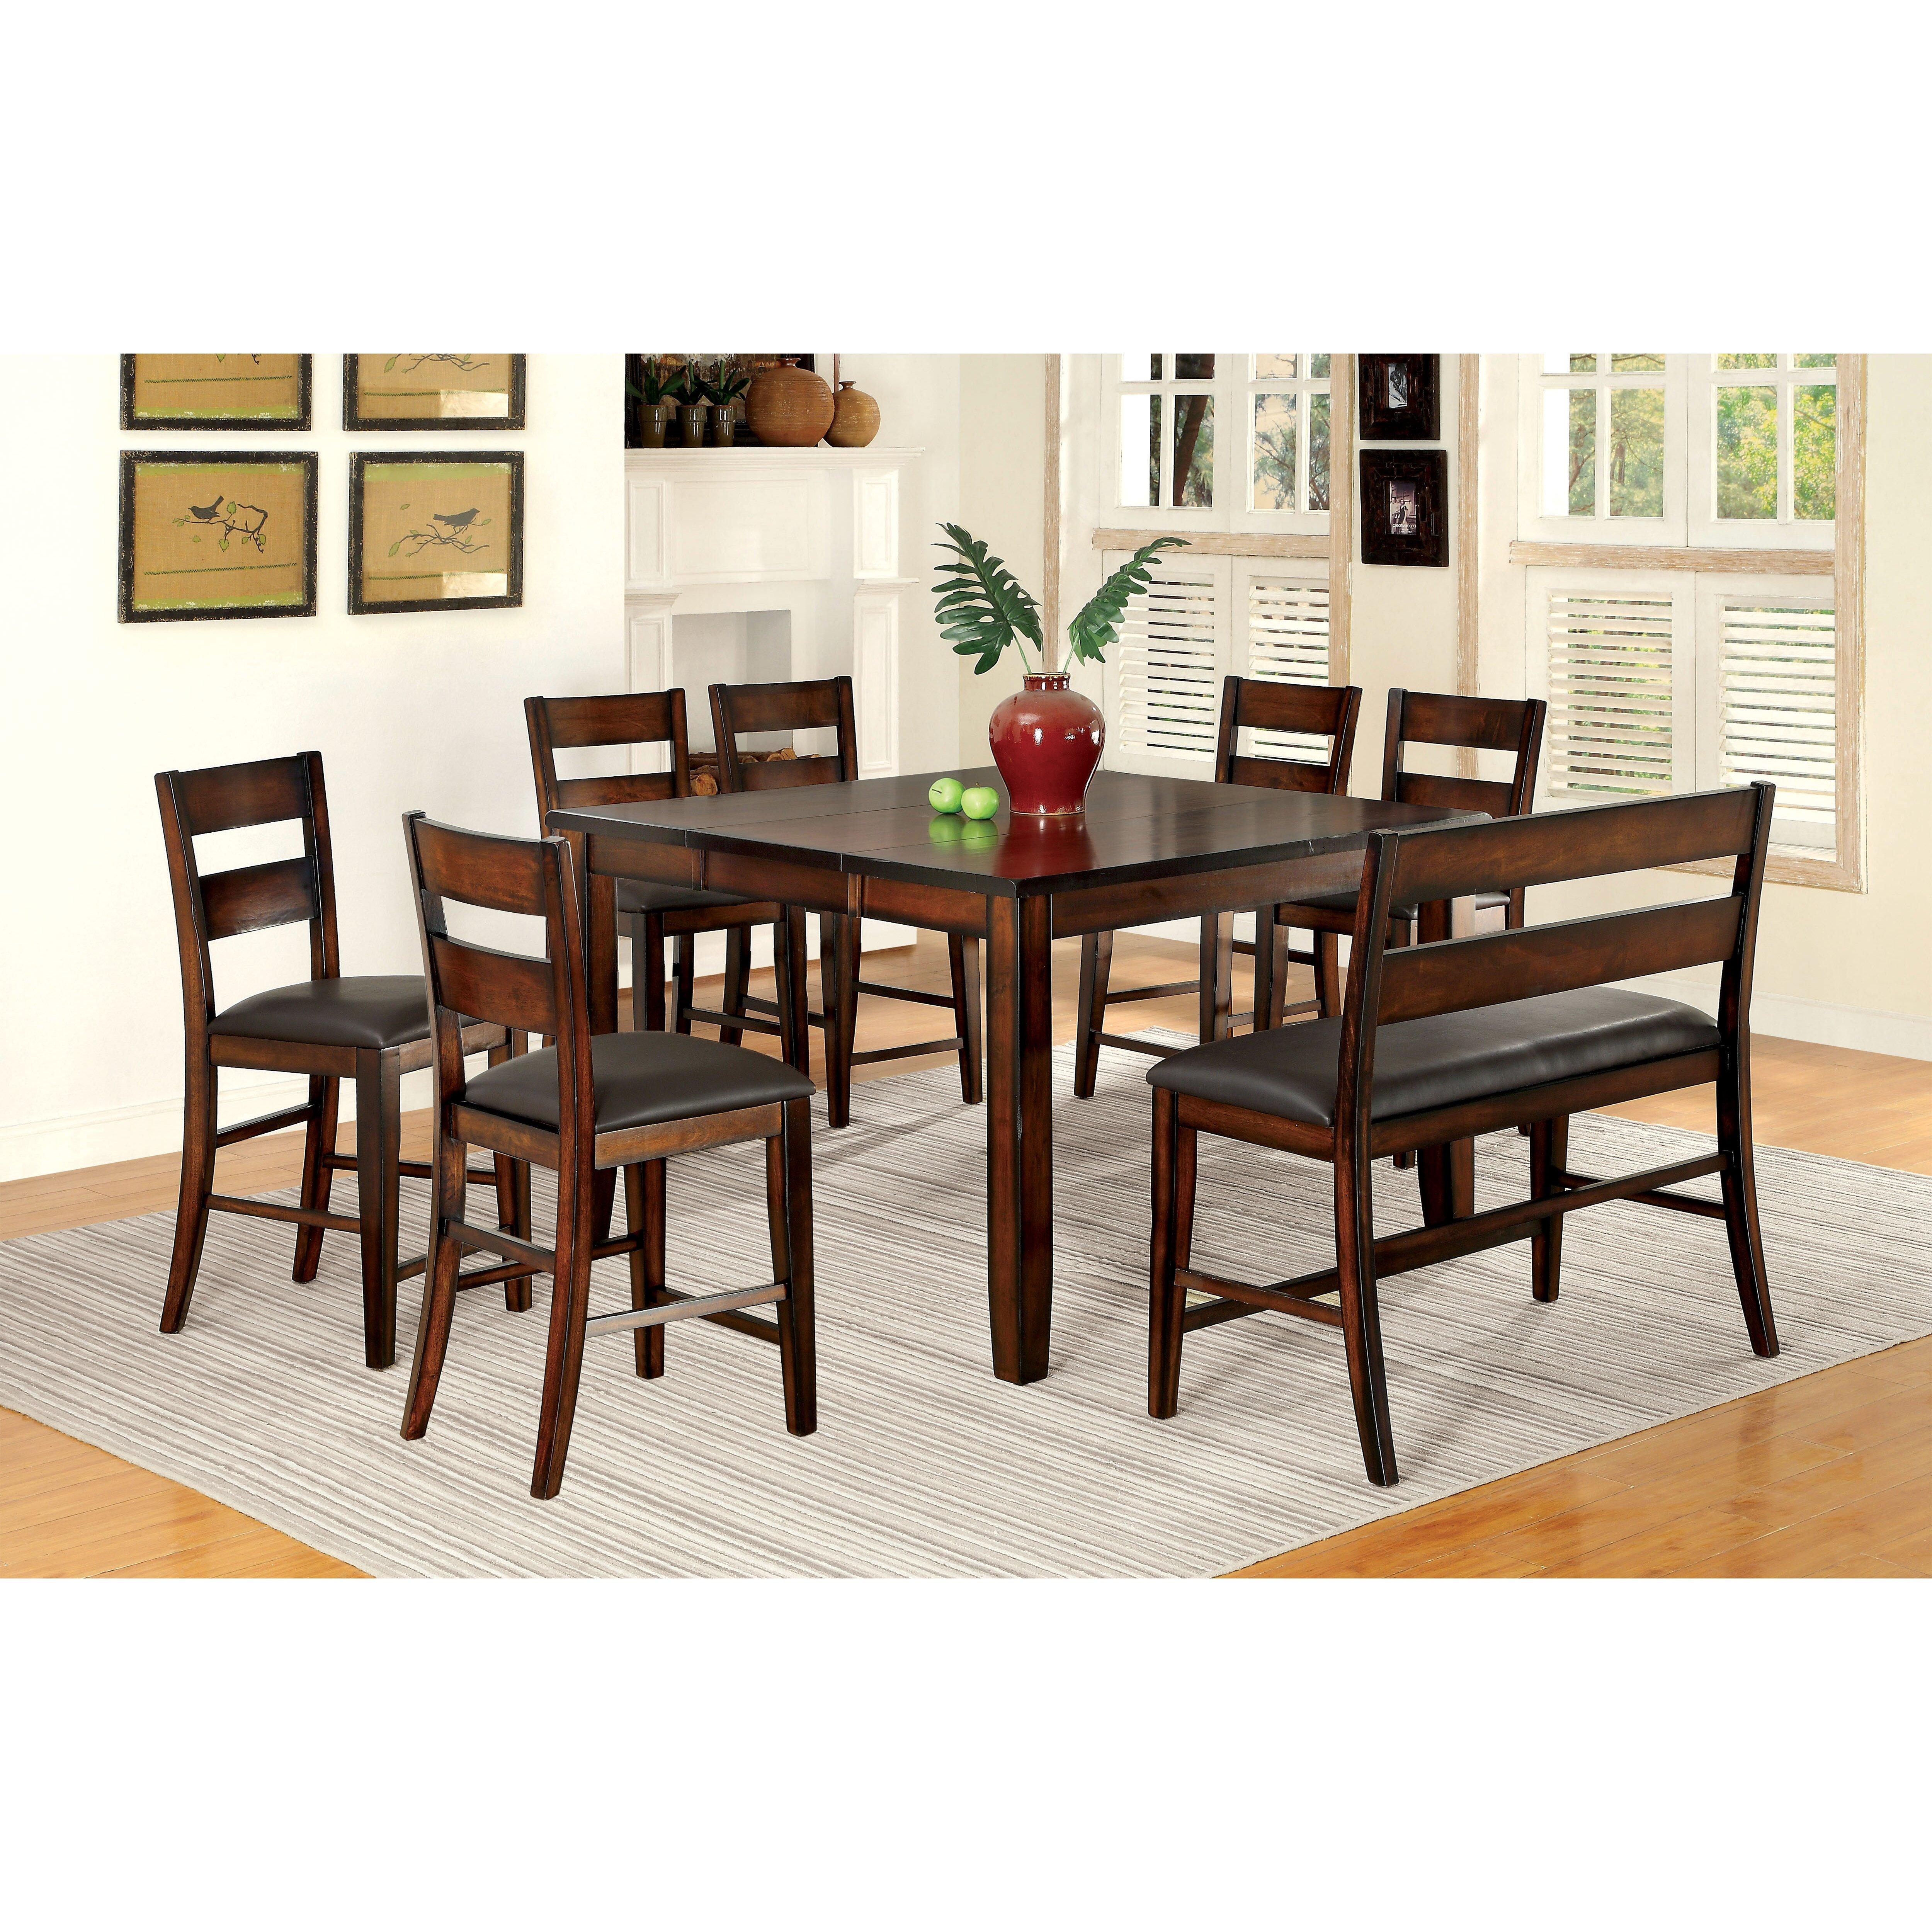 latitude run maliana 8 piece counter height dining set reviews. Black Bedroom Furniture Sets. Home Design Ideas